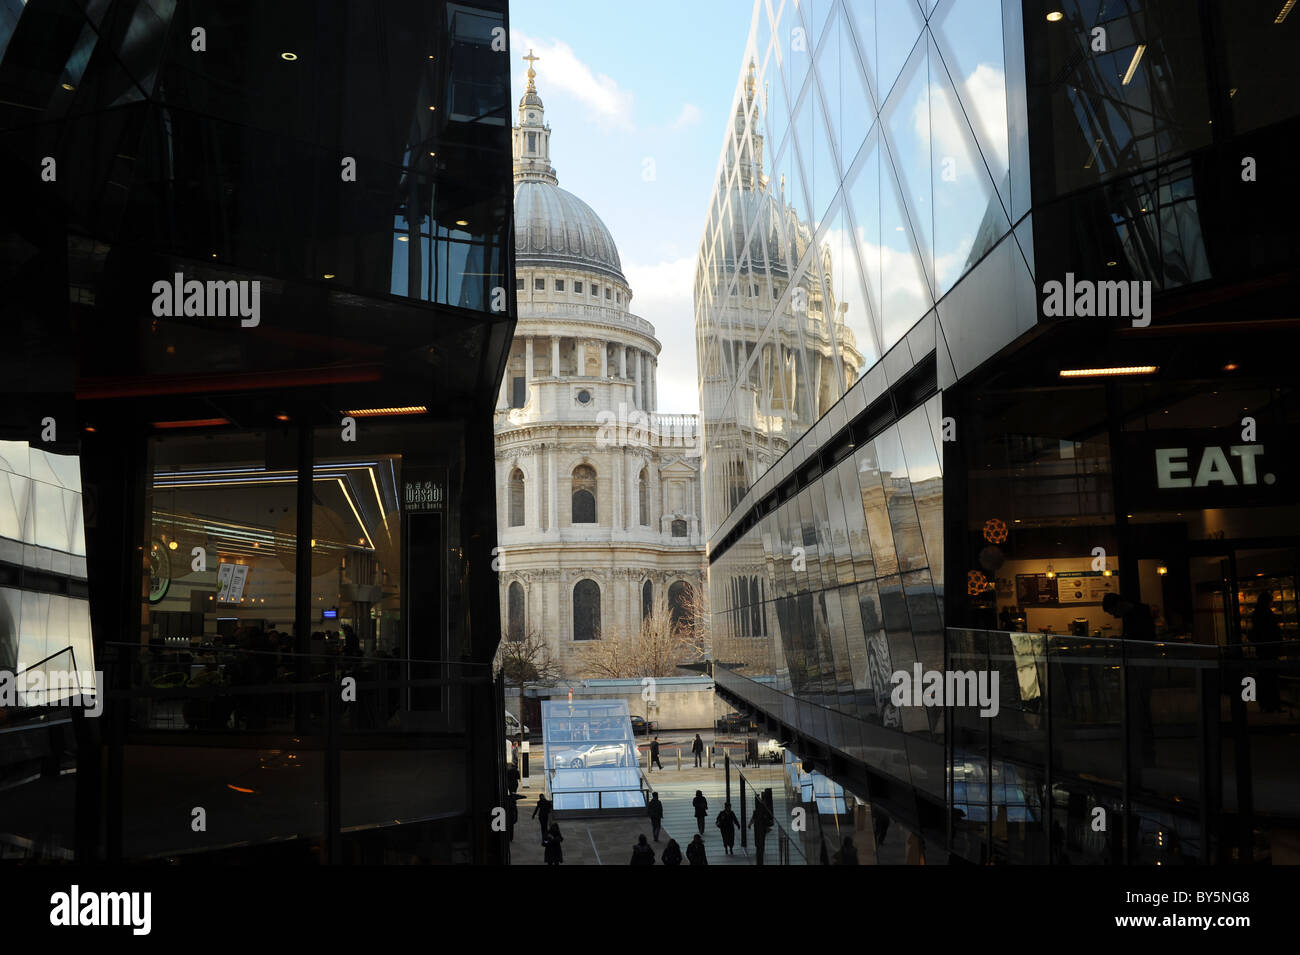 Un nuevo cambio Shopping Centre, Londres, Inglaterra Foto de stock